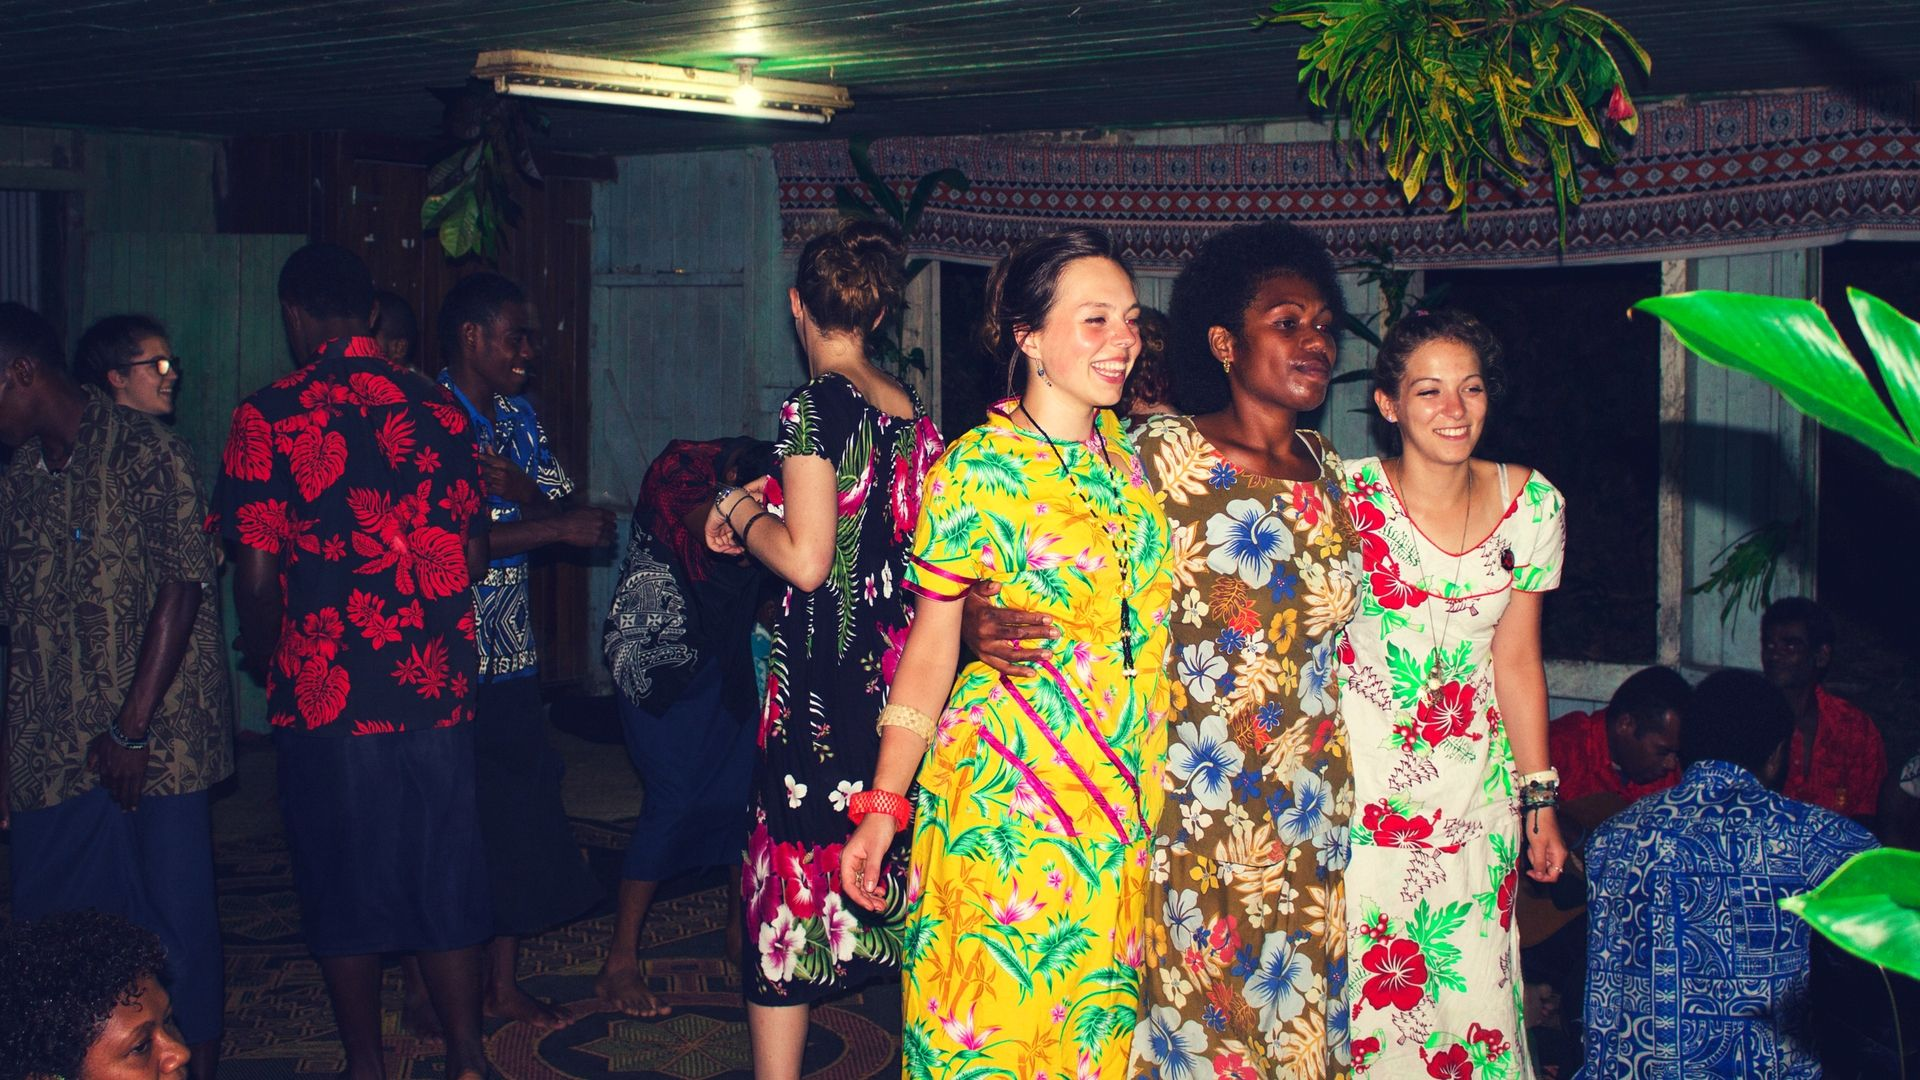 dancing in fiji village